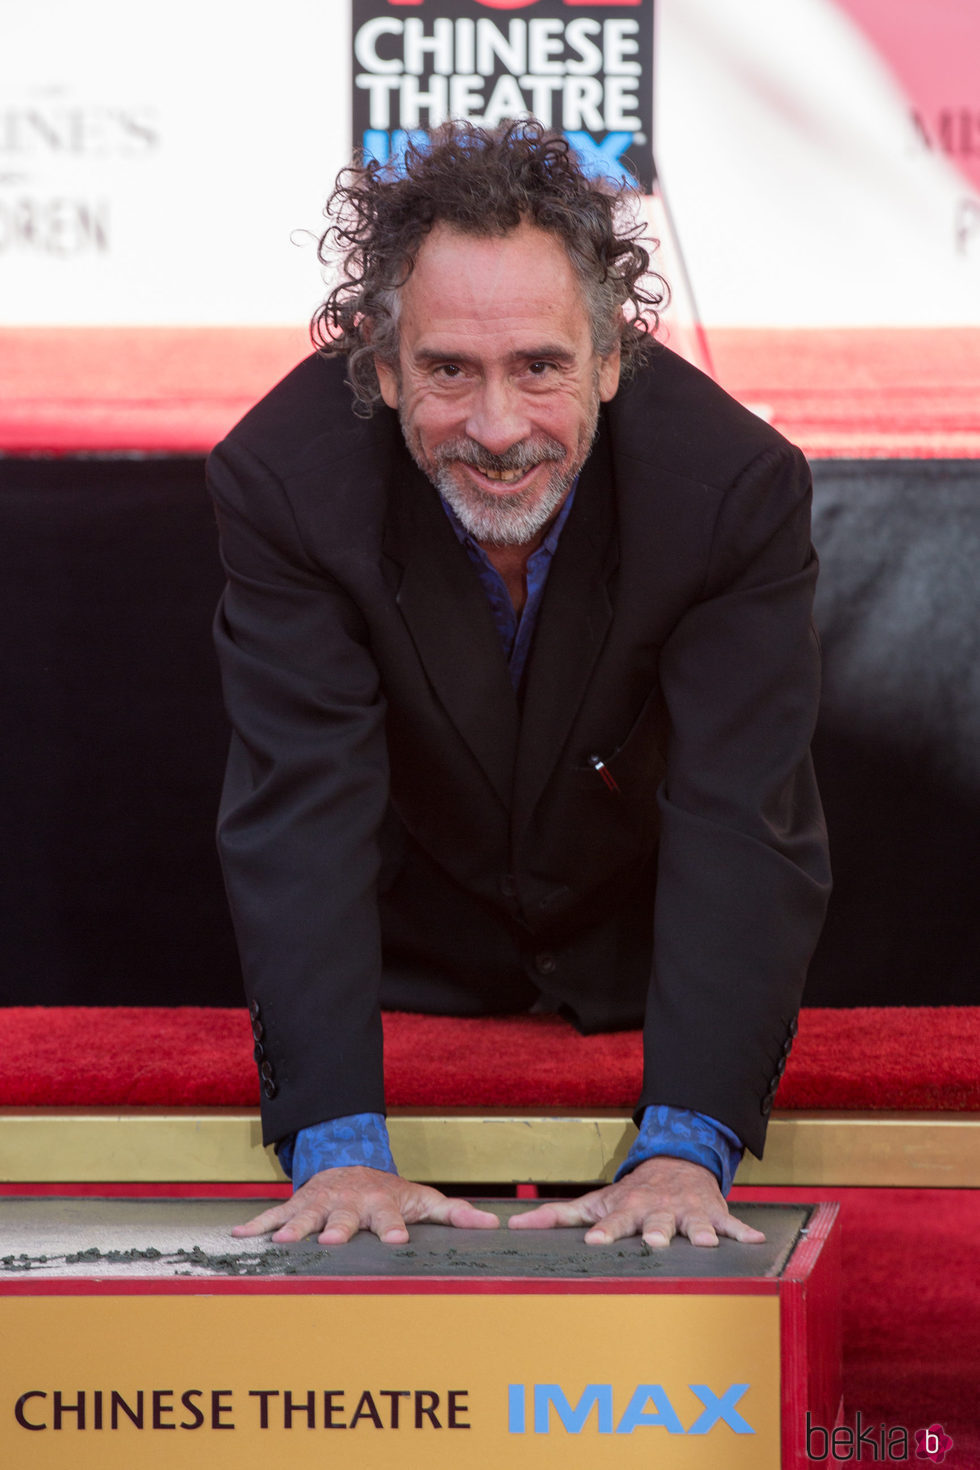 Tim Burton dejando sus huellas frente al Teatro Chino de Hollywood